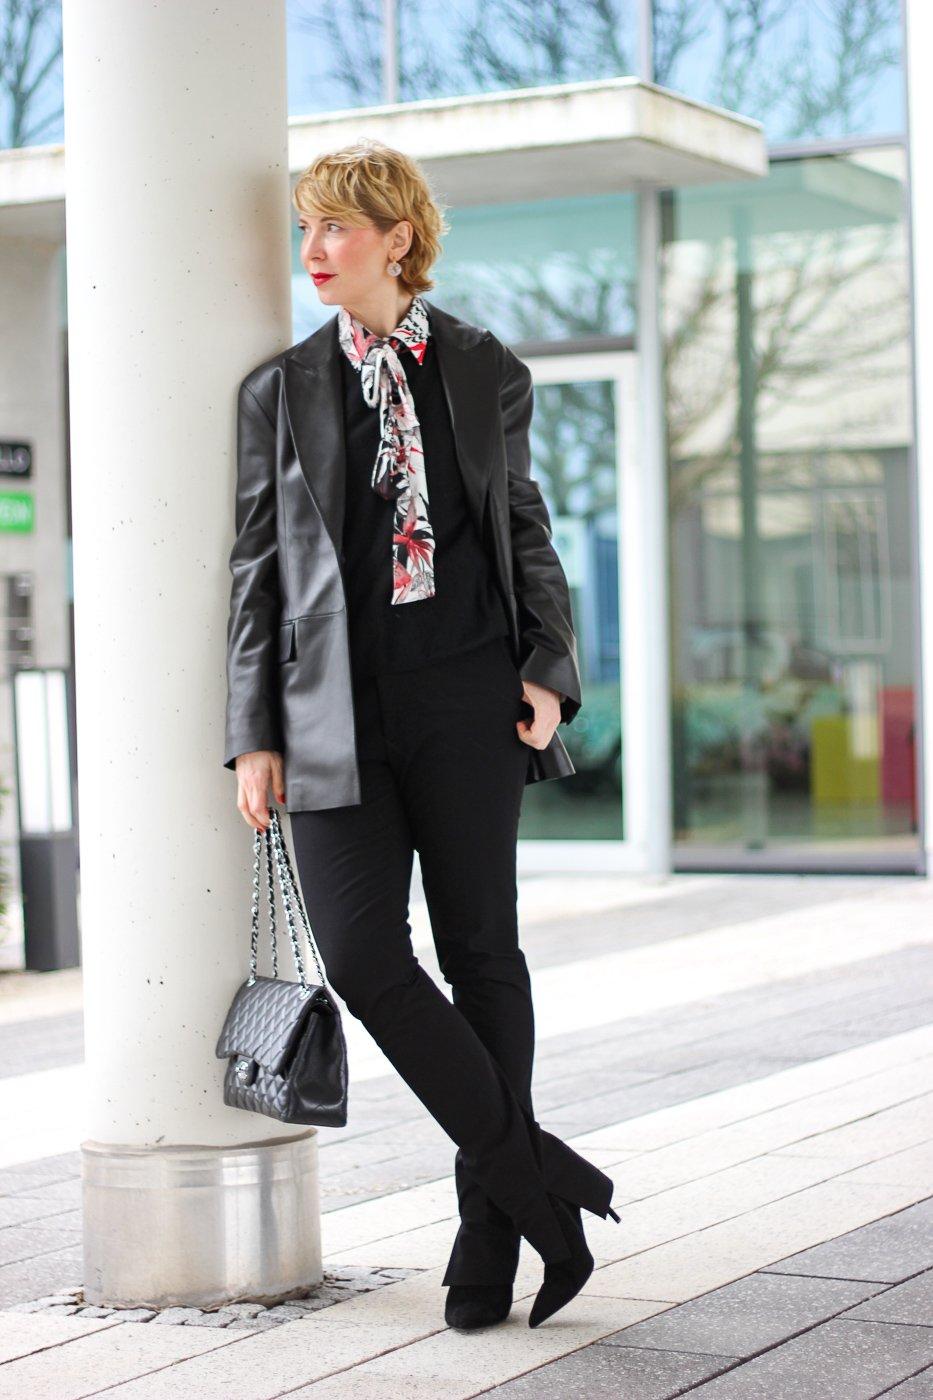 conny doll lifestyle: Lederblazer, Schluppenbluse, Hose mit Schlitz, Übergangsstyling, Frühlingslook